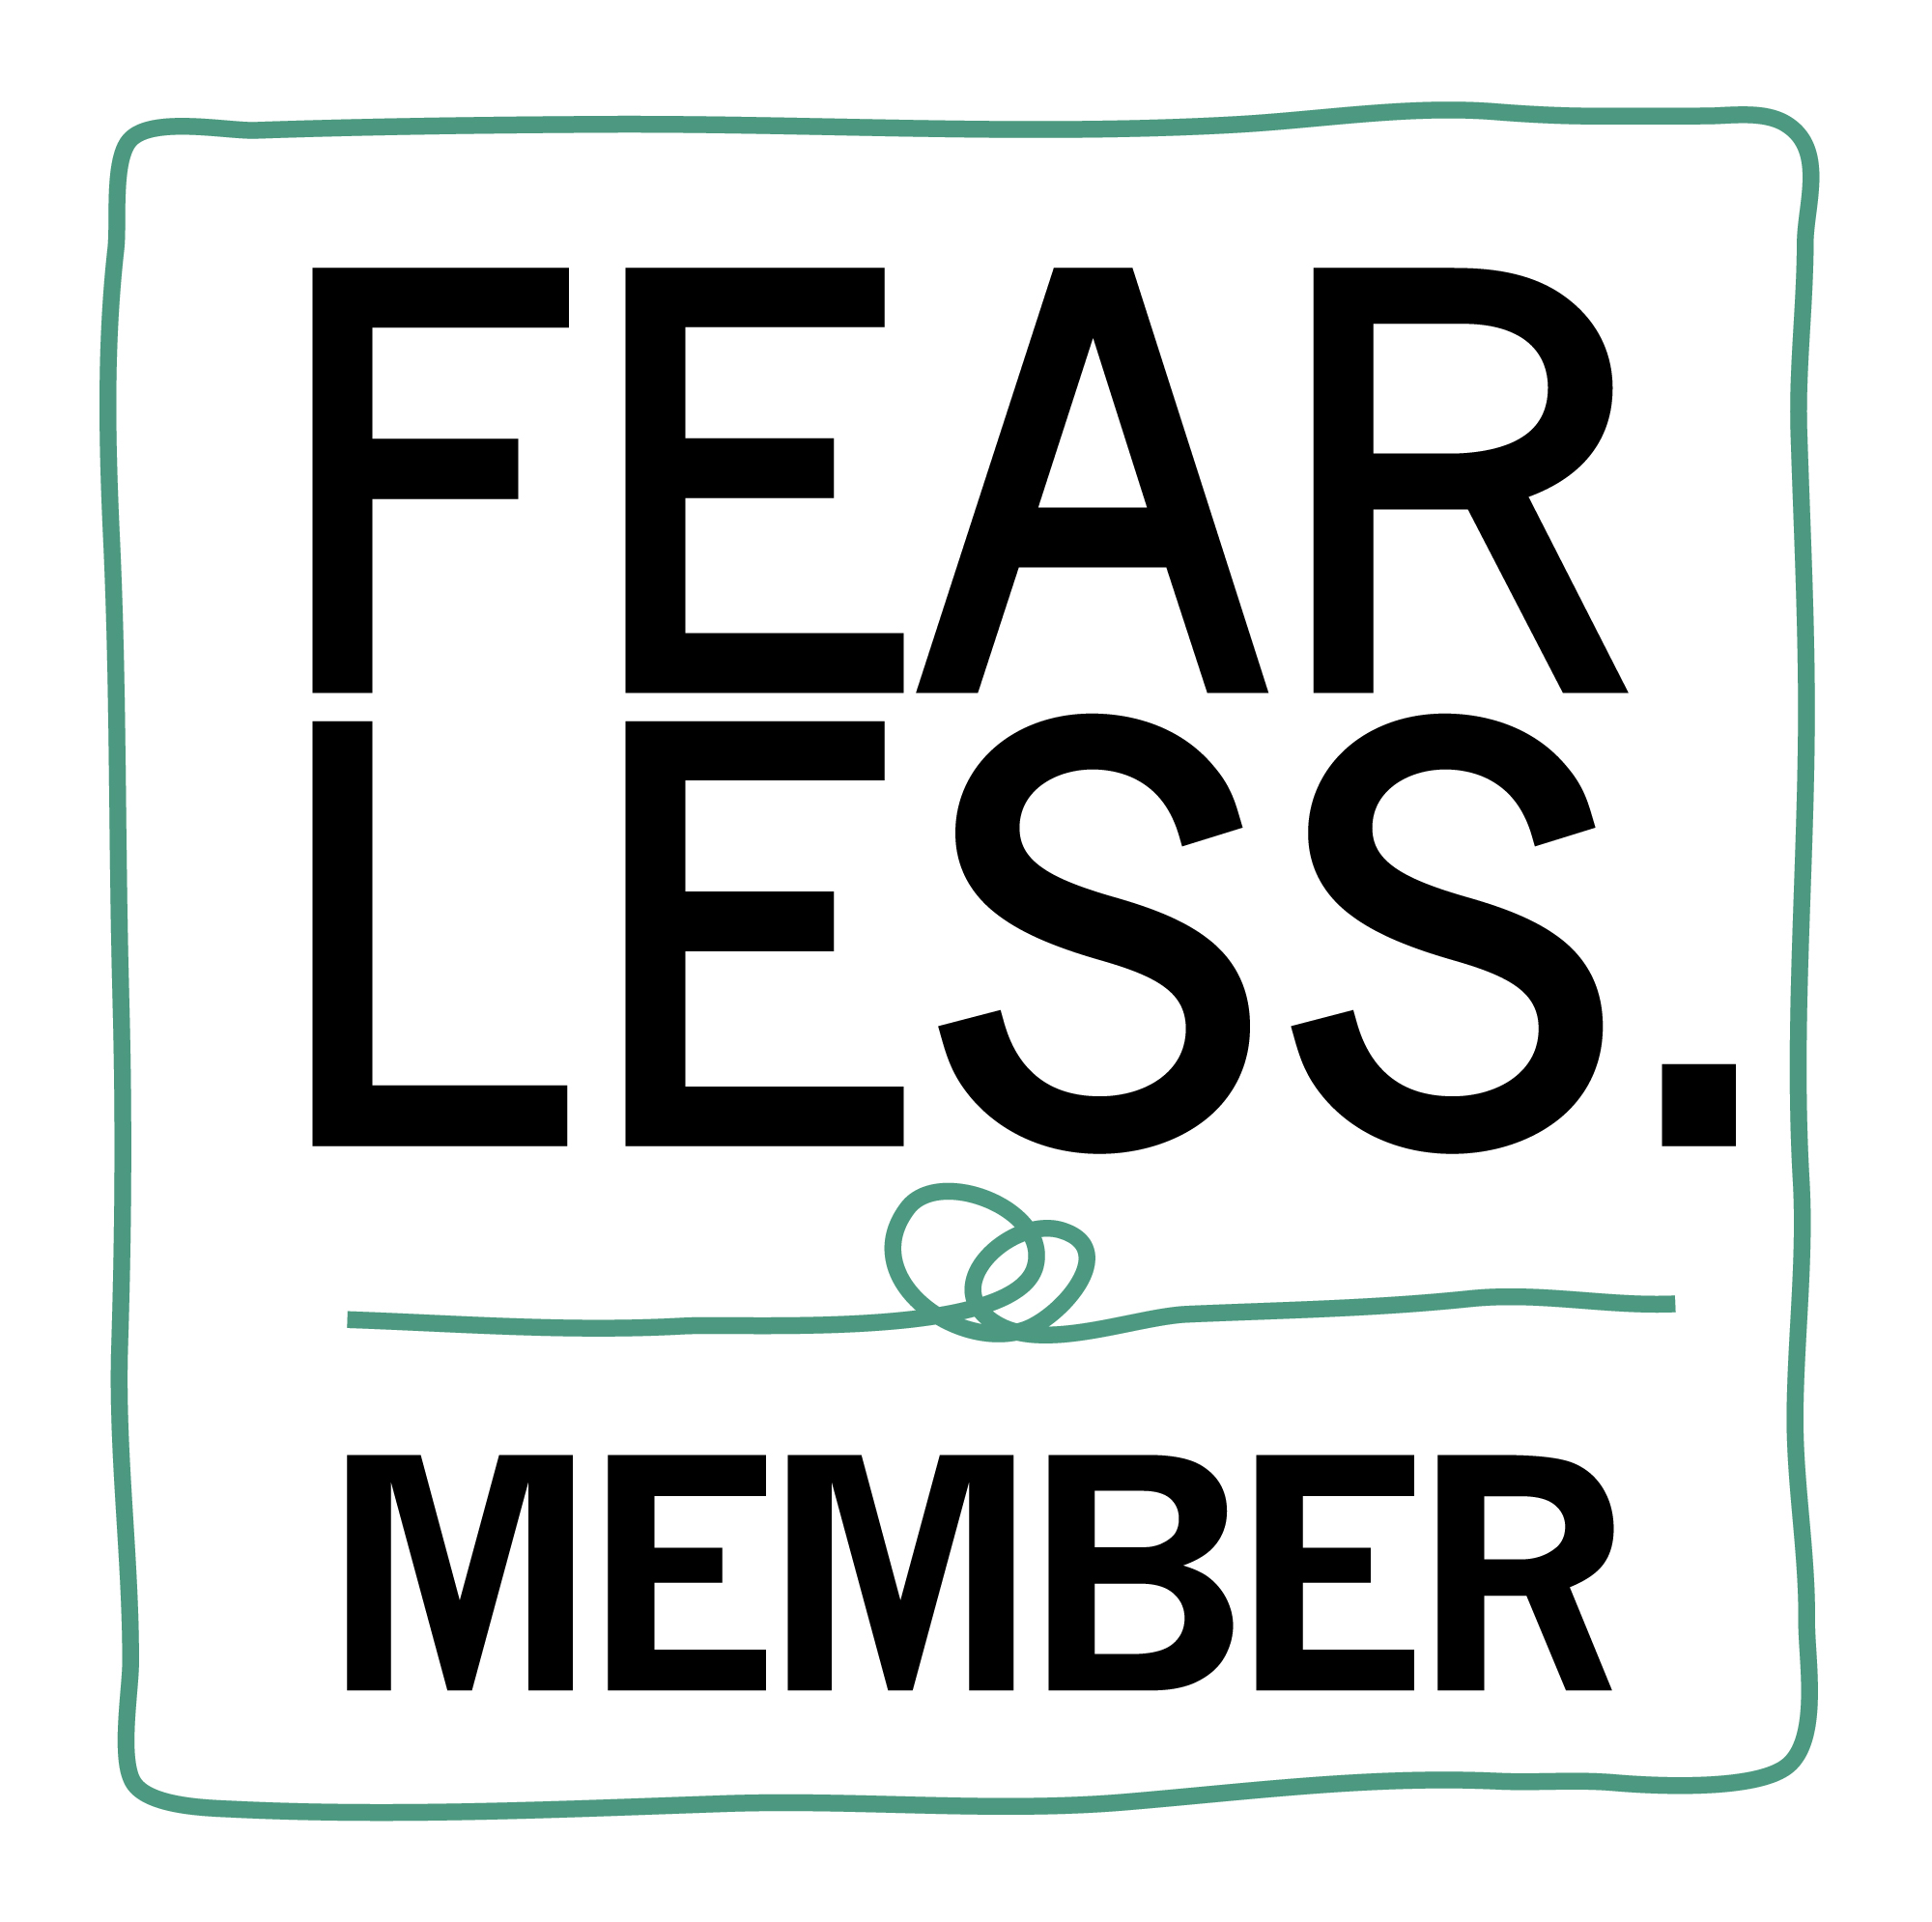 fearless-member-white